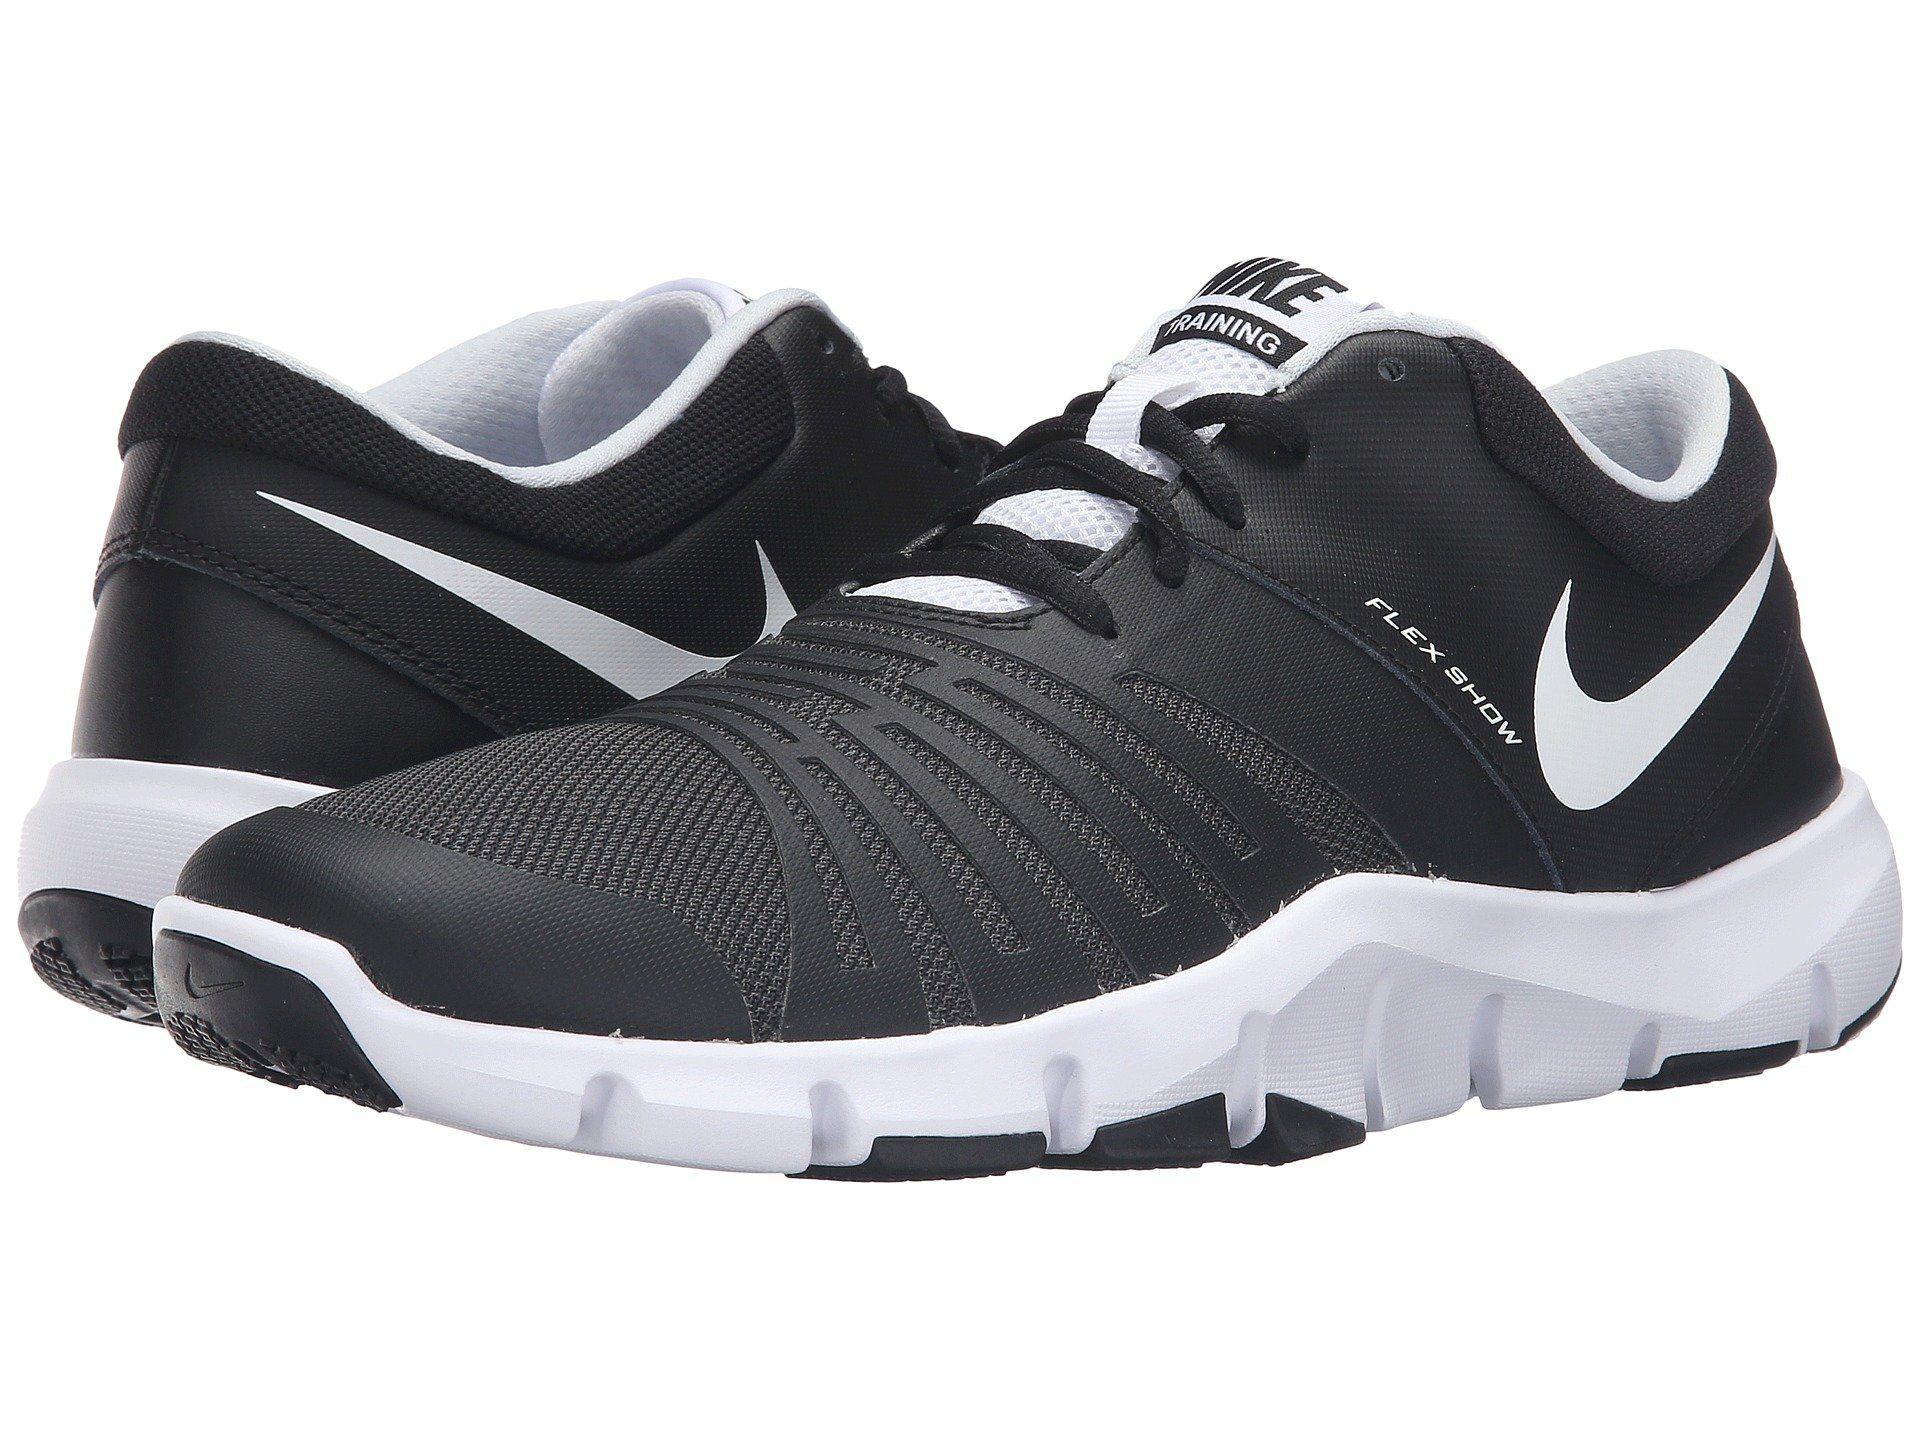 Nike Flex Show Tr 5 In Black/white